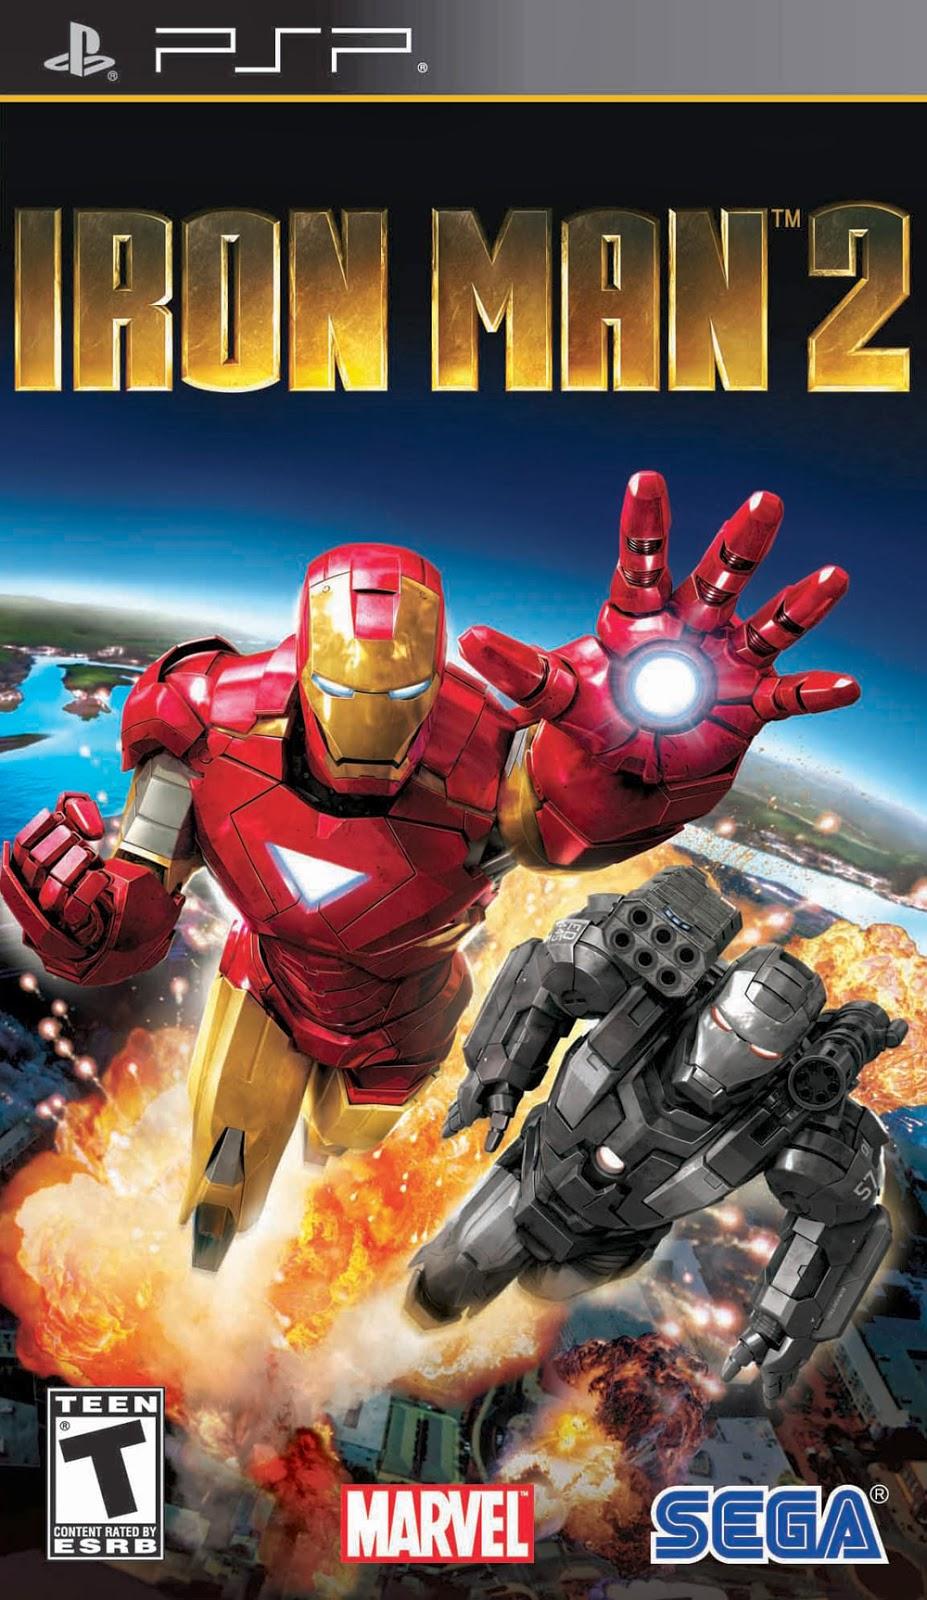 Iron man Psp iso